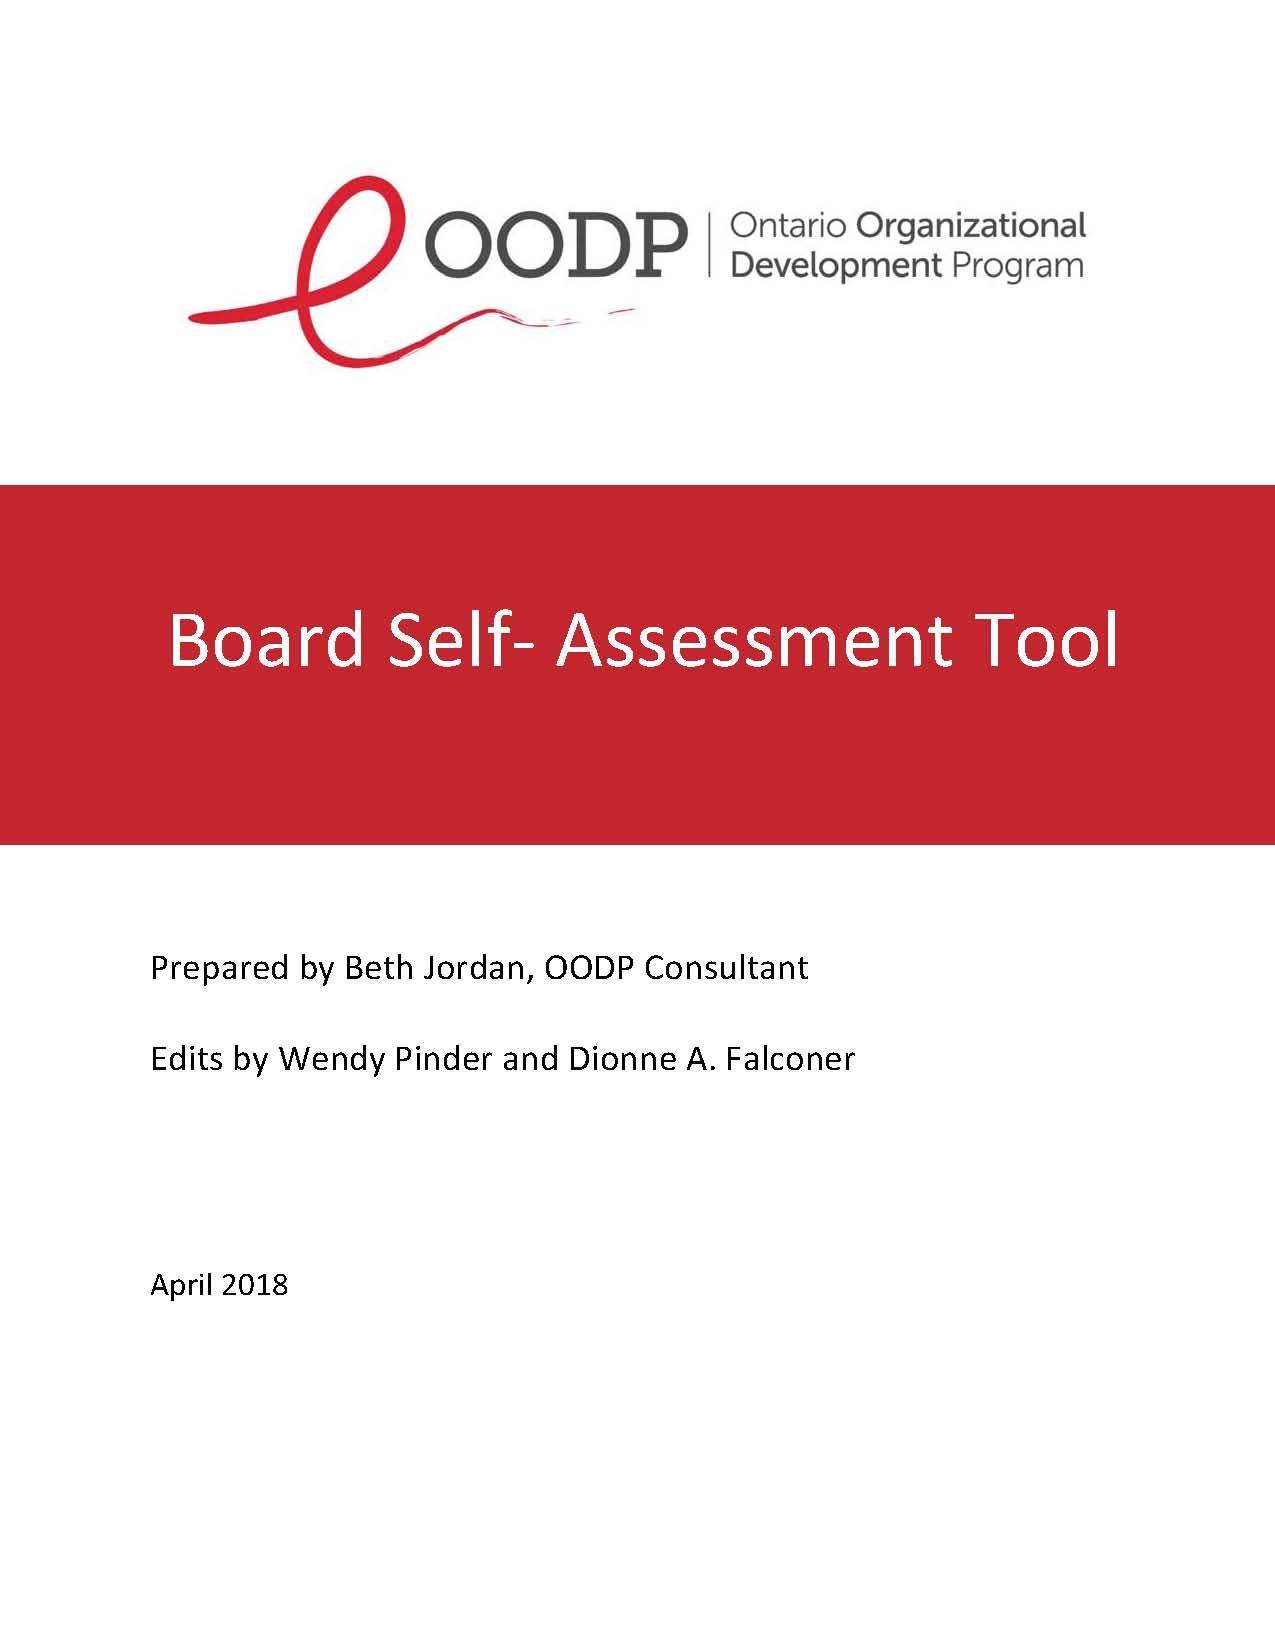 OODP Board Self-Assessment Tool